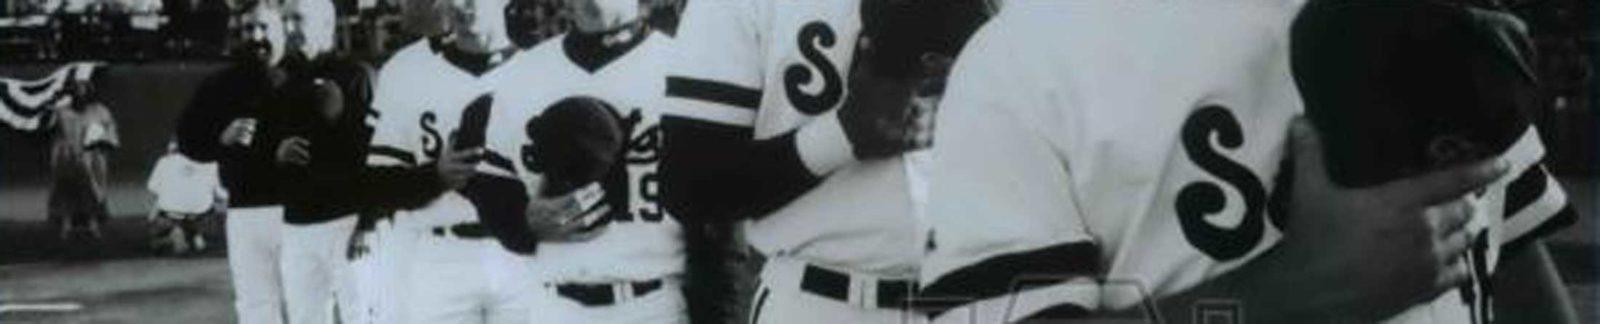 Baseball, Minnesota header